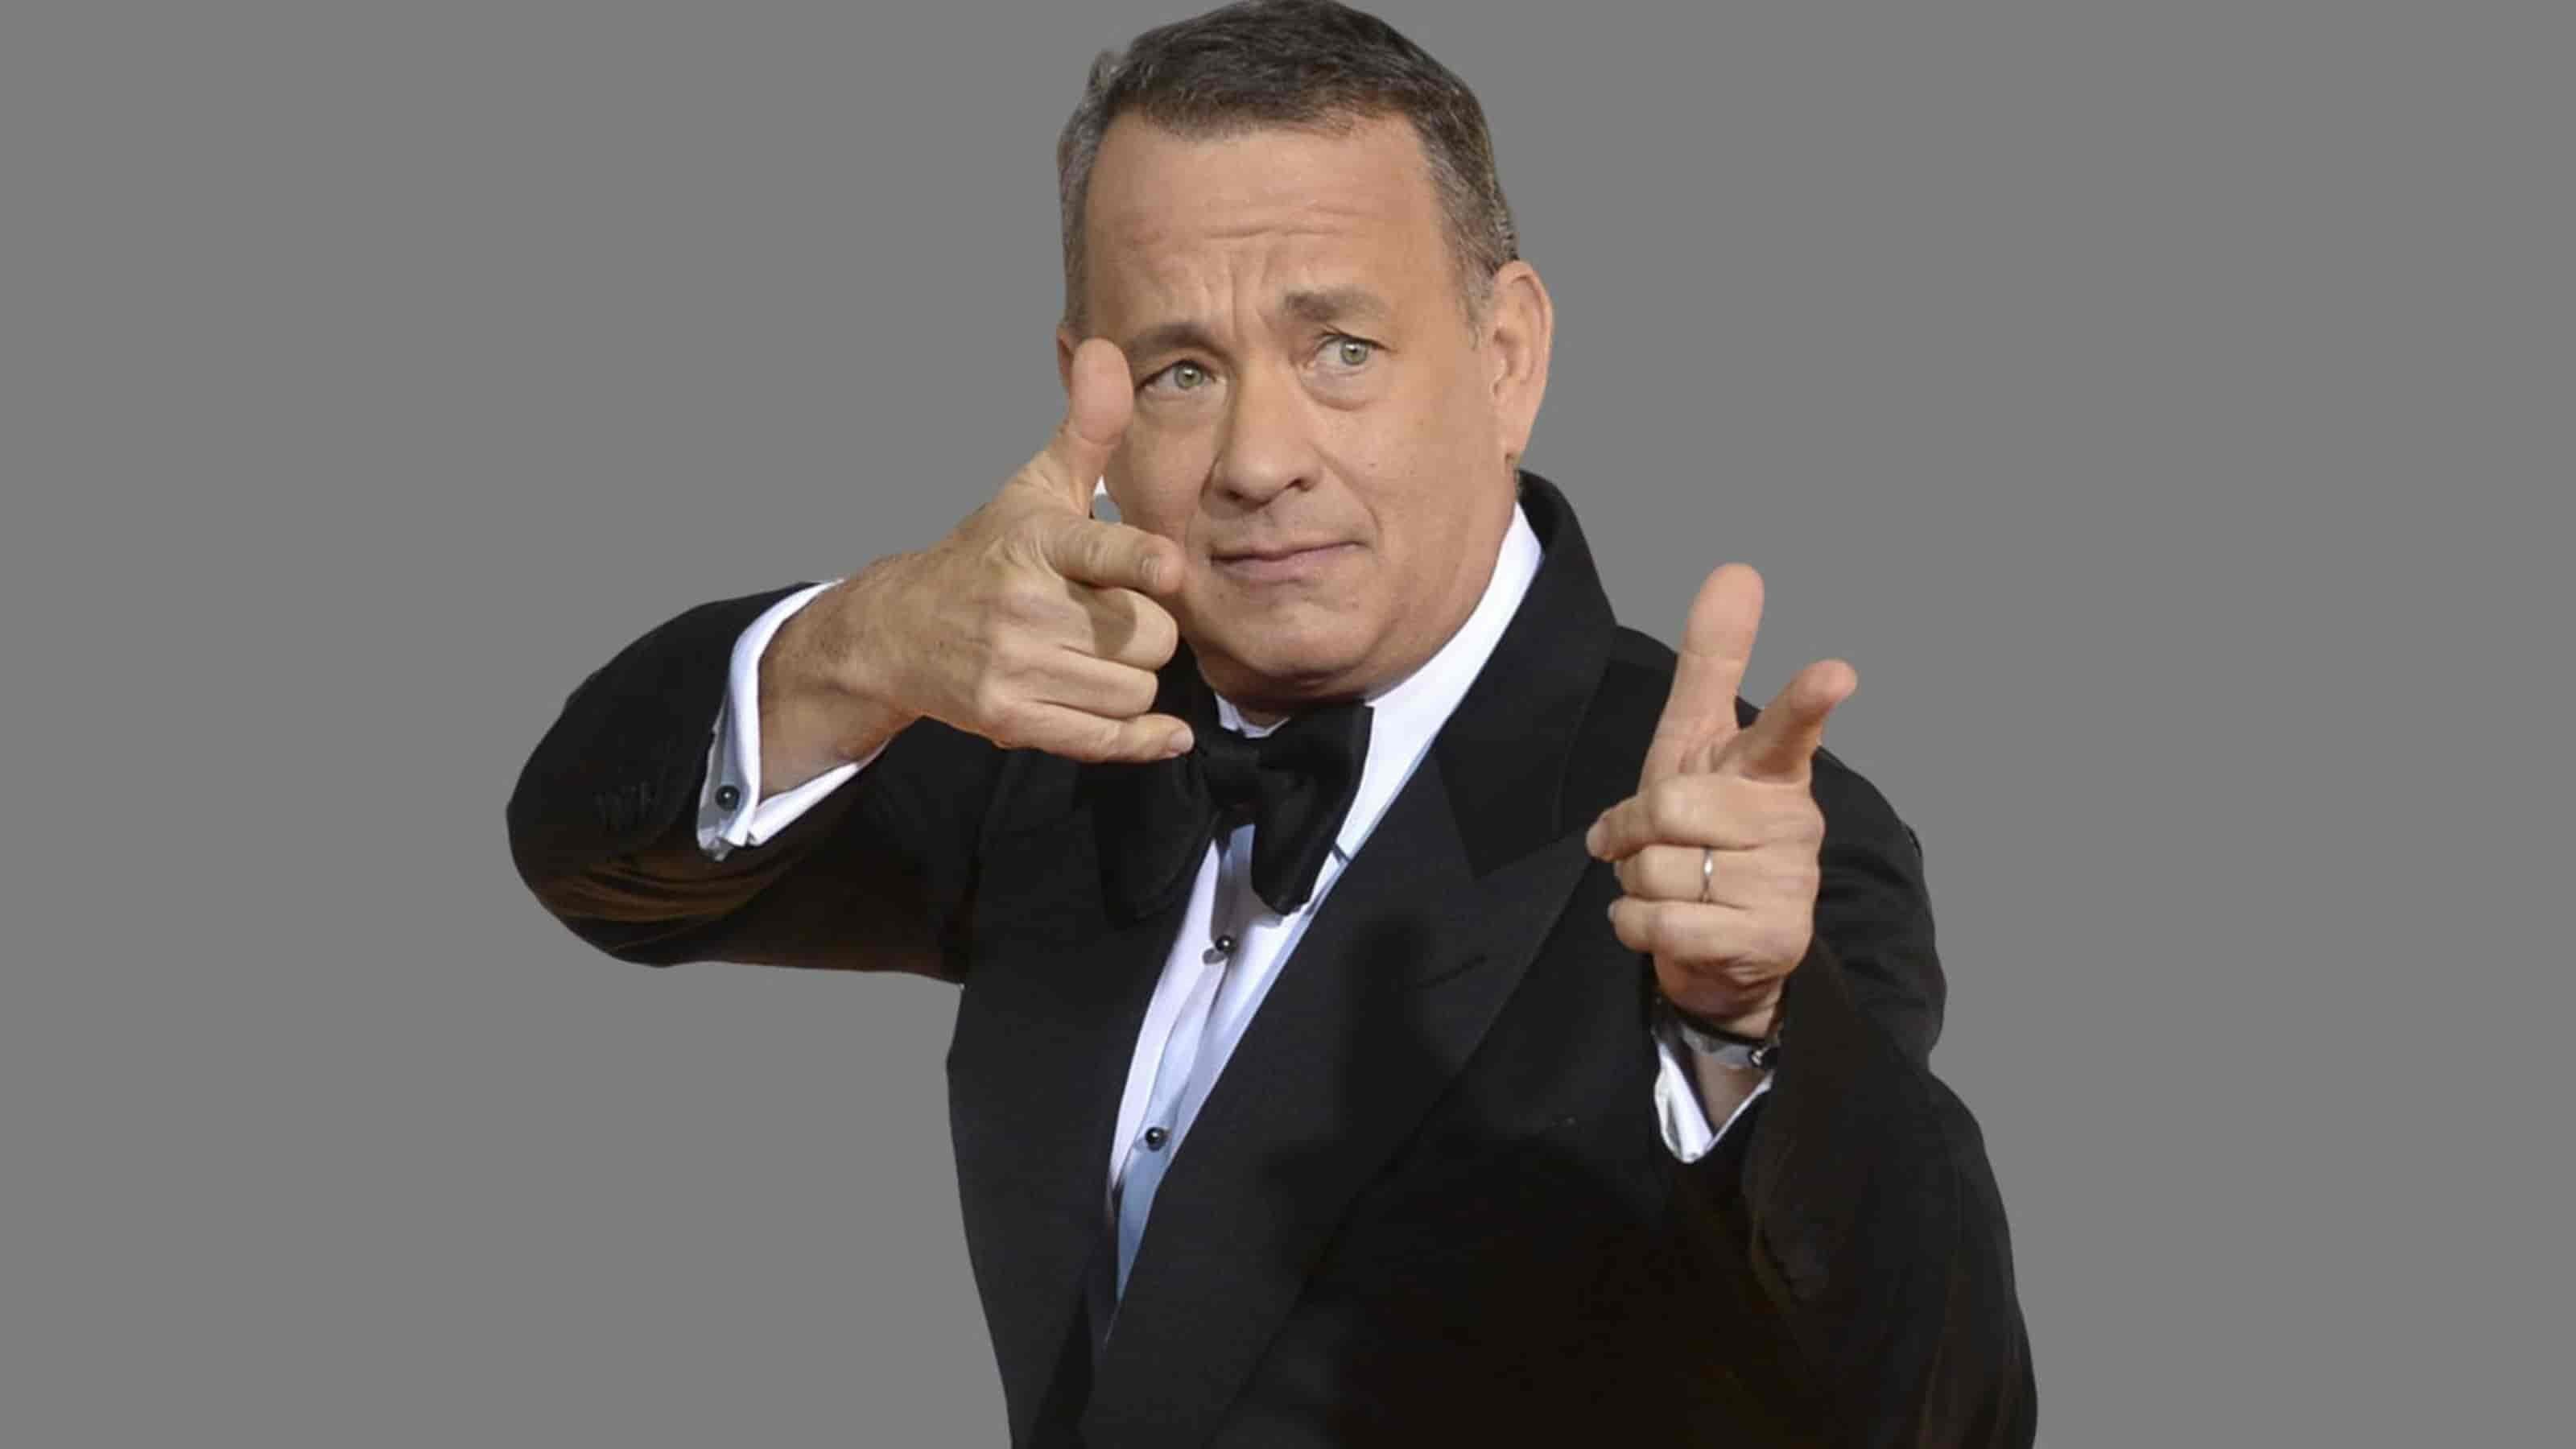 Tom Hanks visar upp sina pek-skills